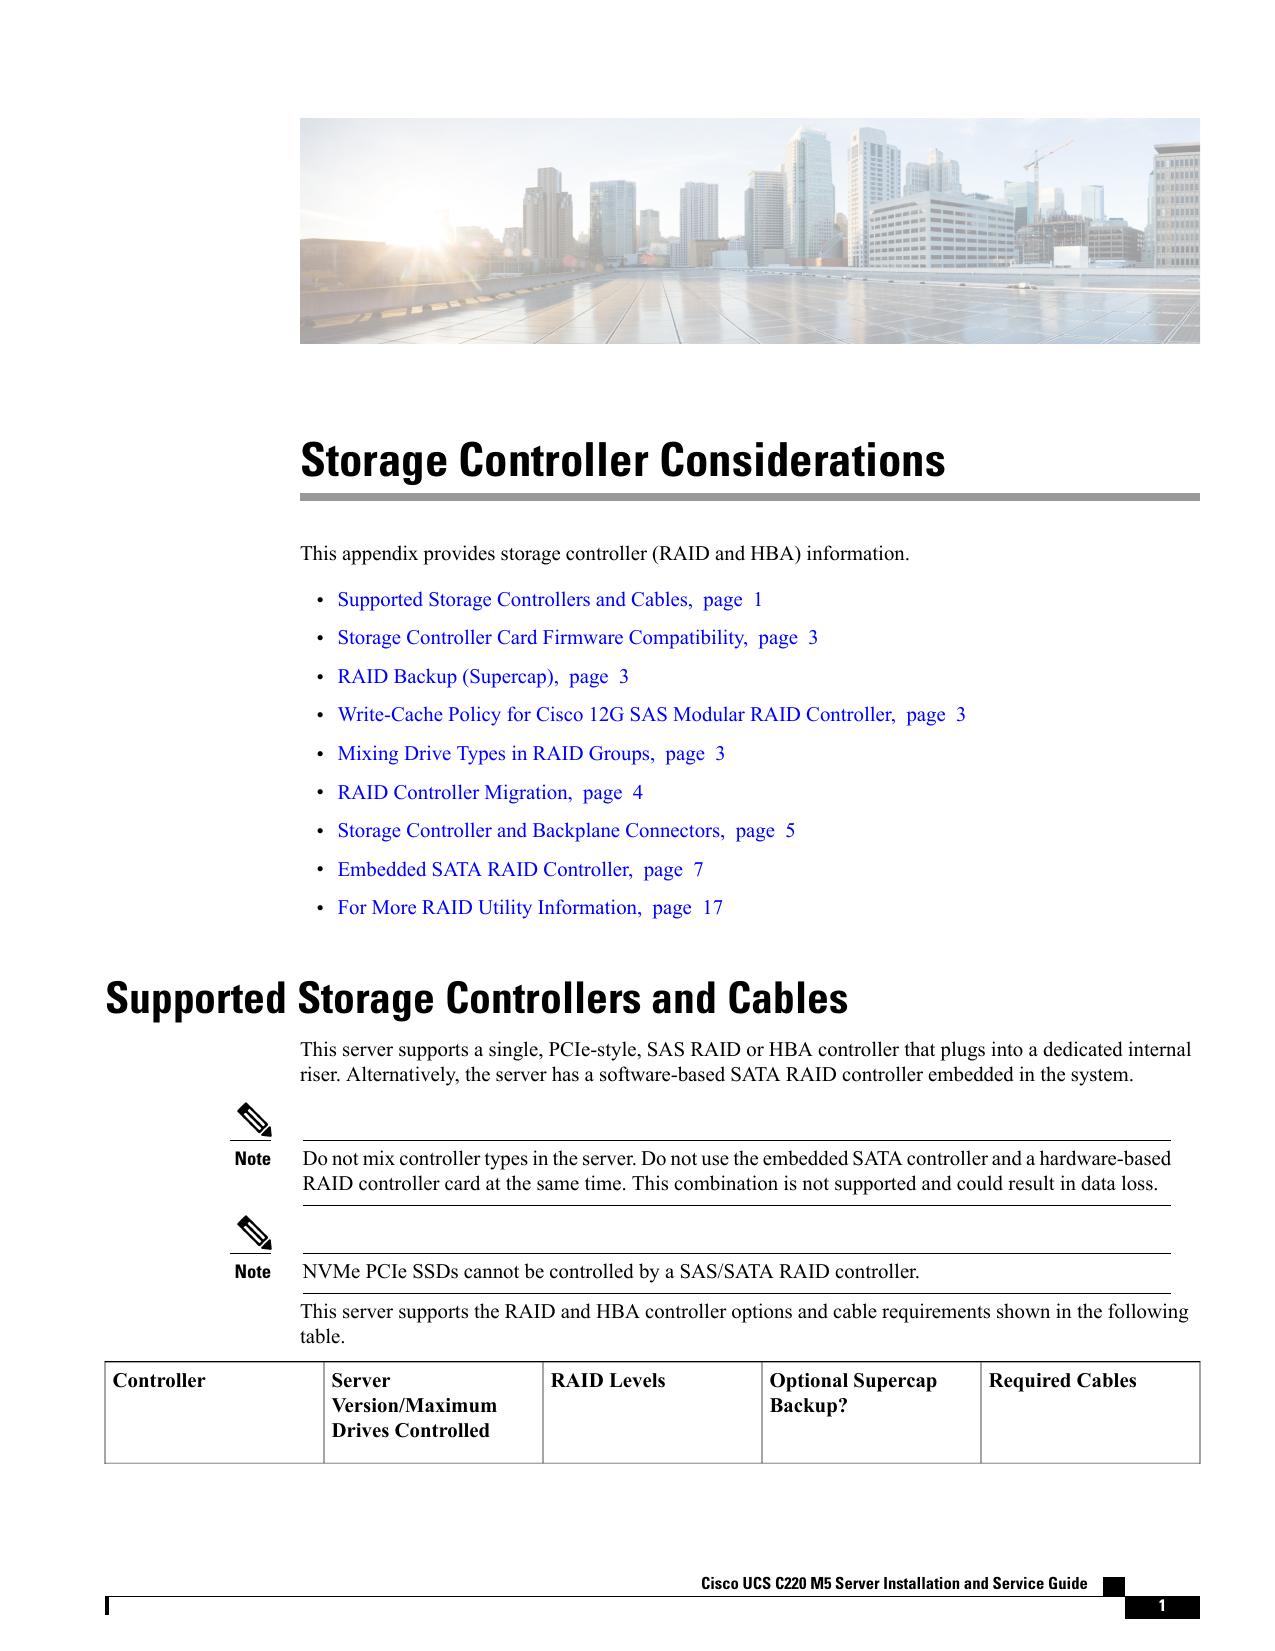 Storage Controller Considerations | manualzz com